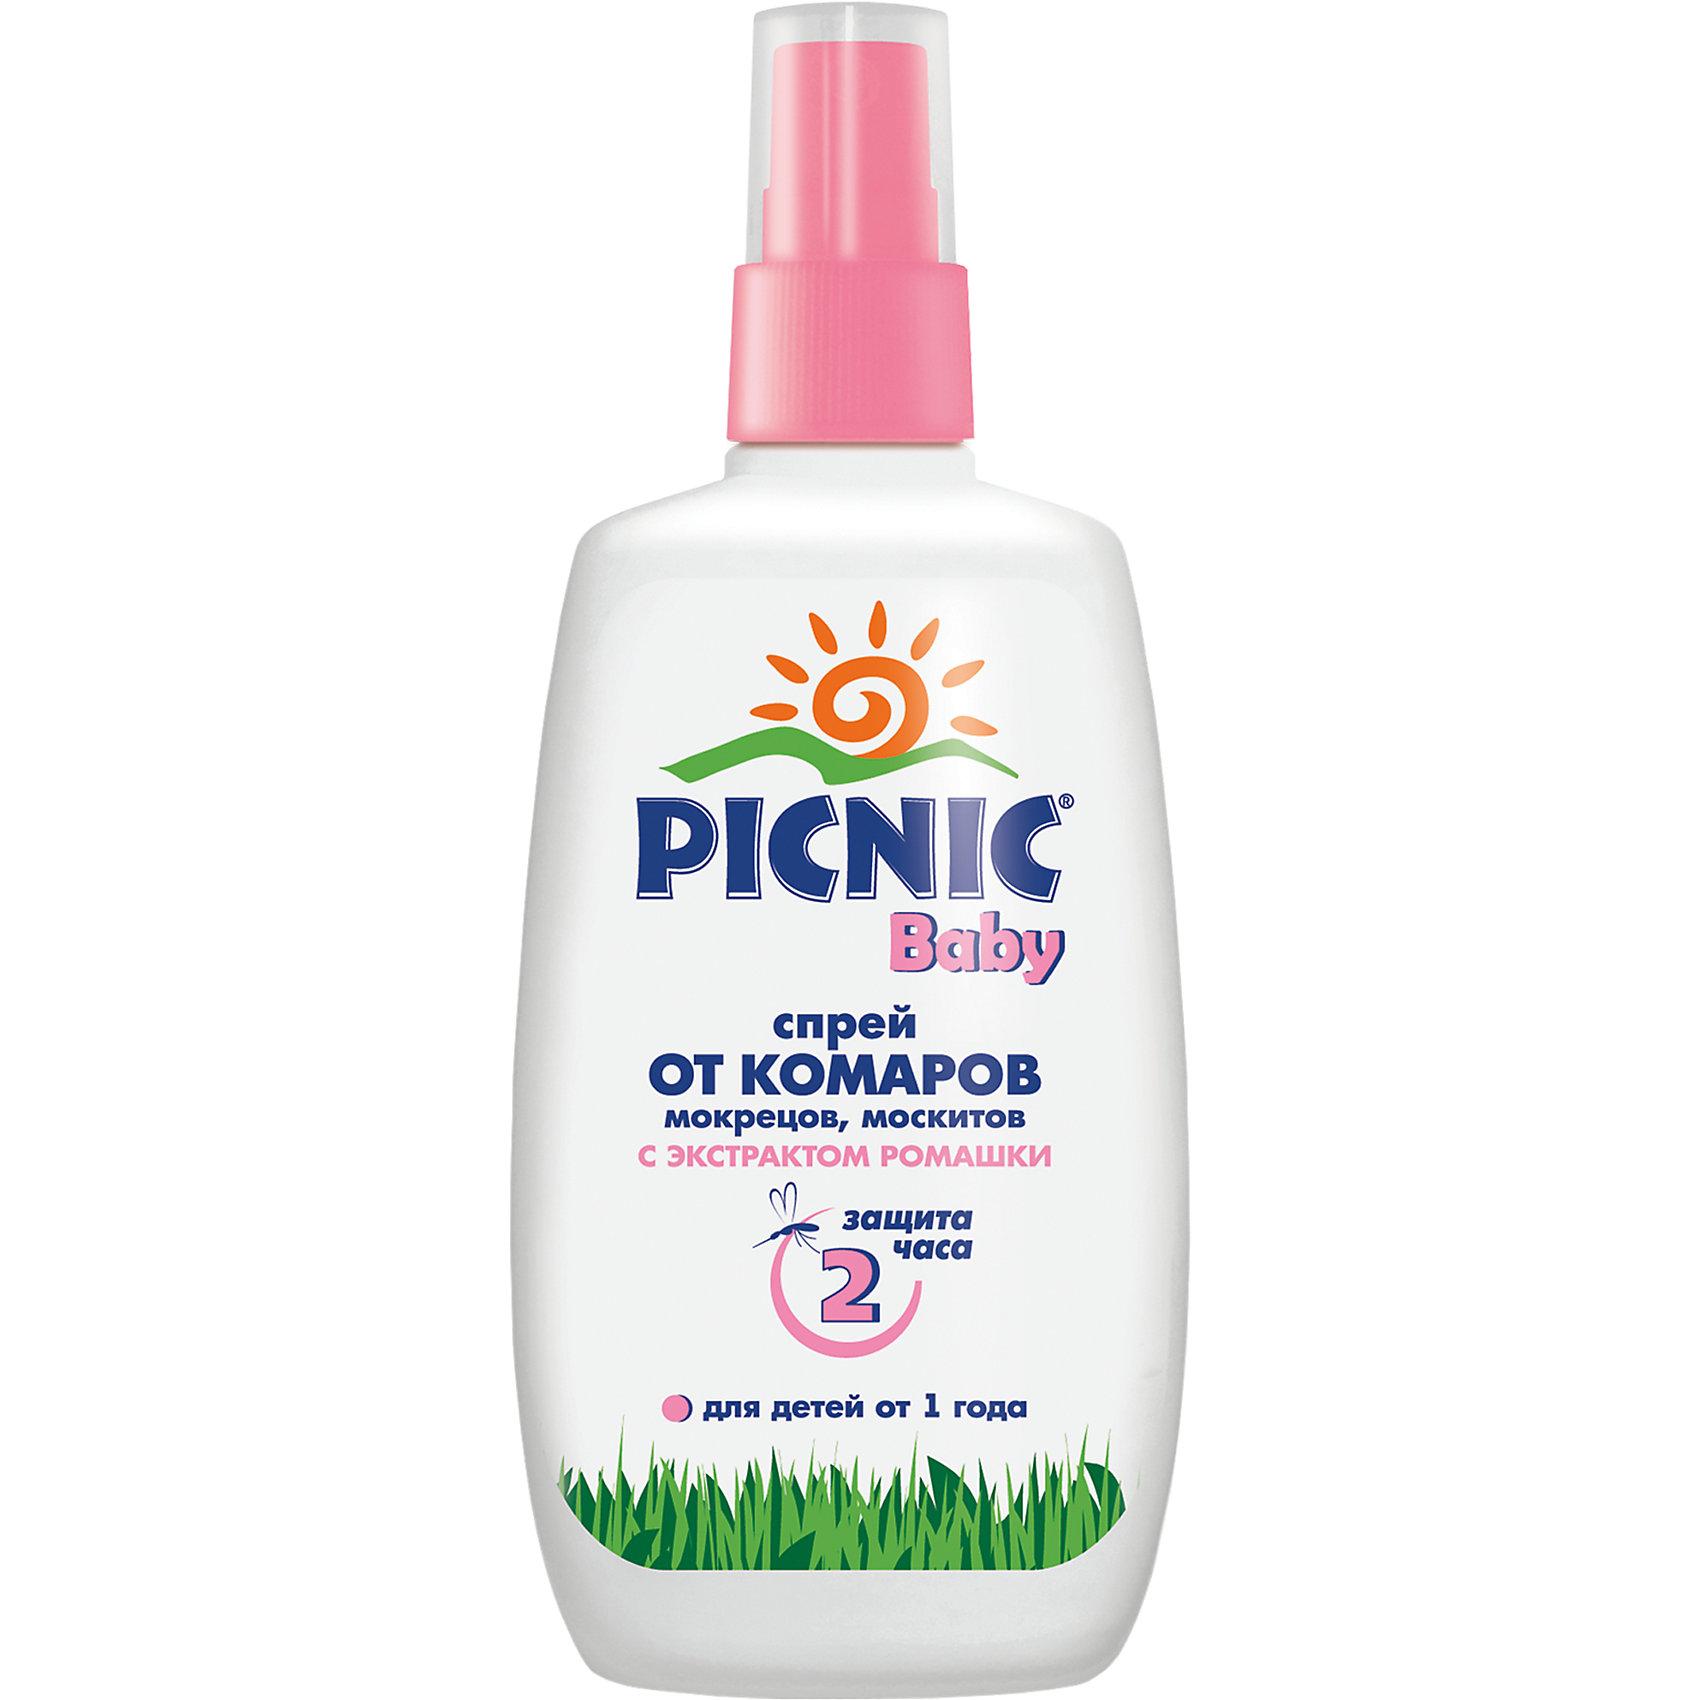 Picnic Спрей от комаров, 120 мл., Picnic Baby средства от насекомых picnic крем пенка от комаров 160 мл